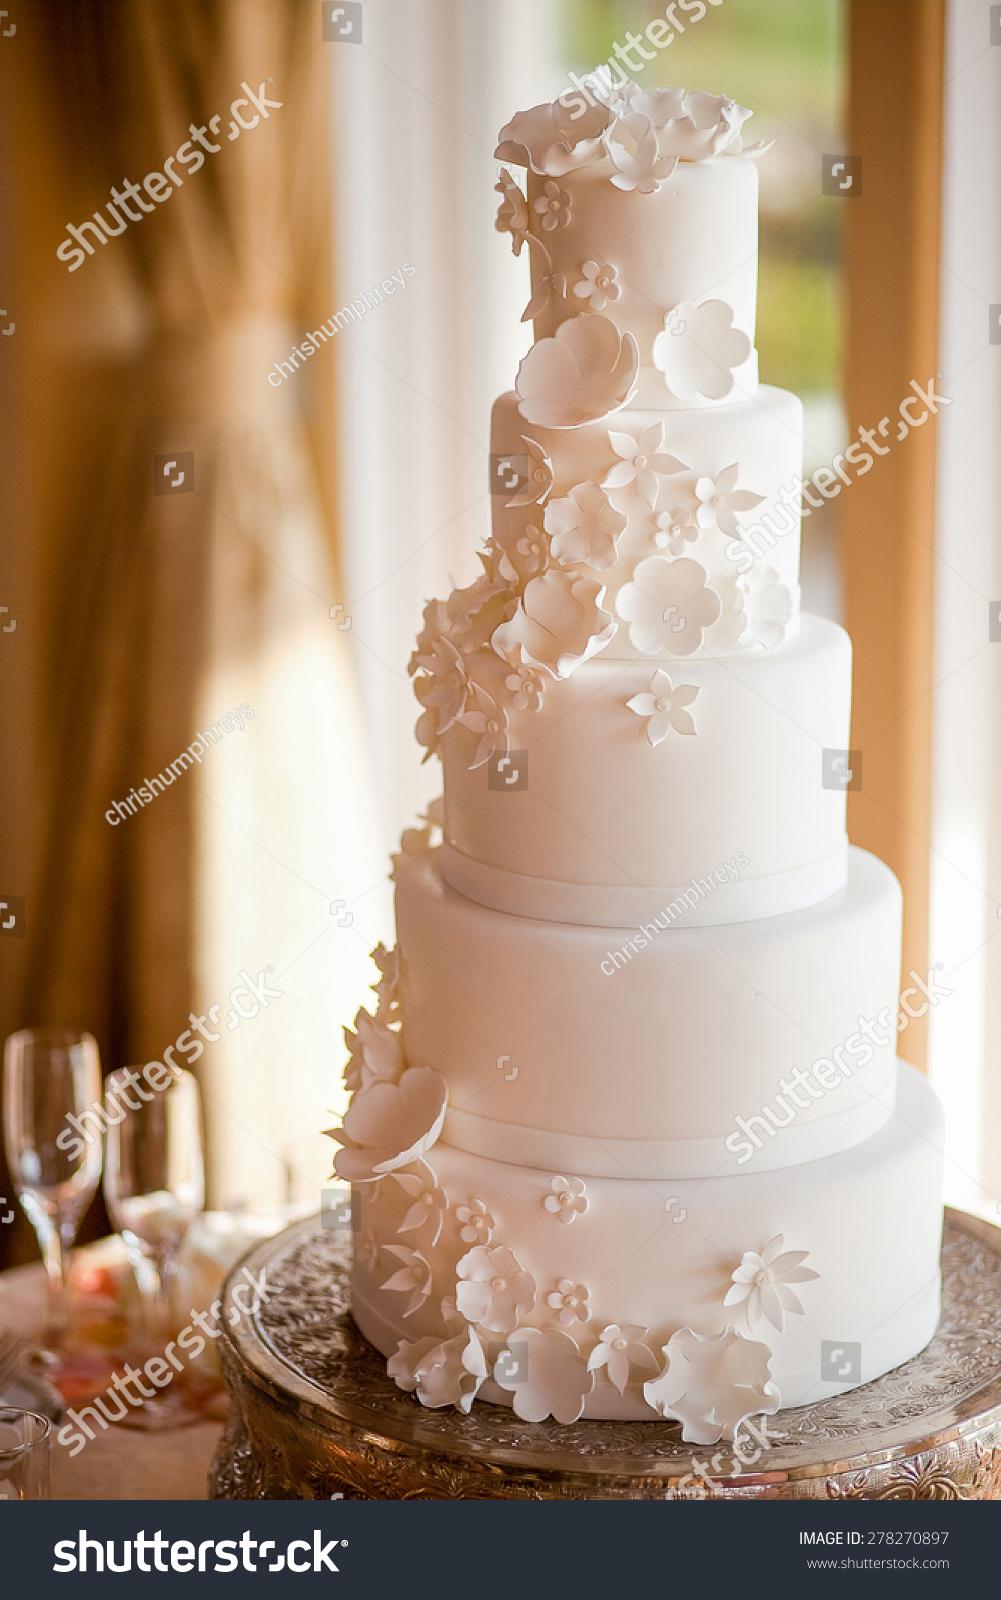 Beautiful White Wedding Cake Stock Photo 278270897